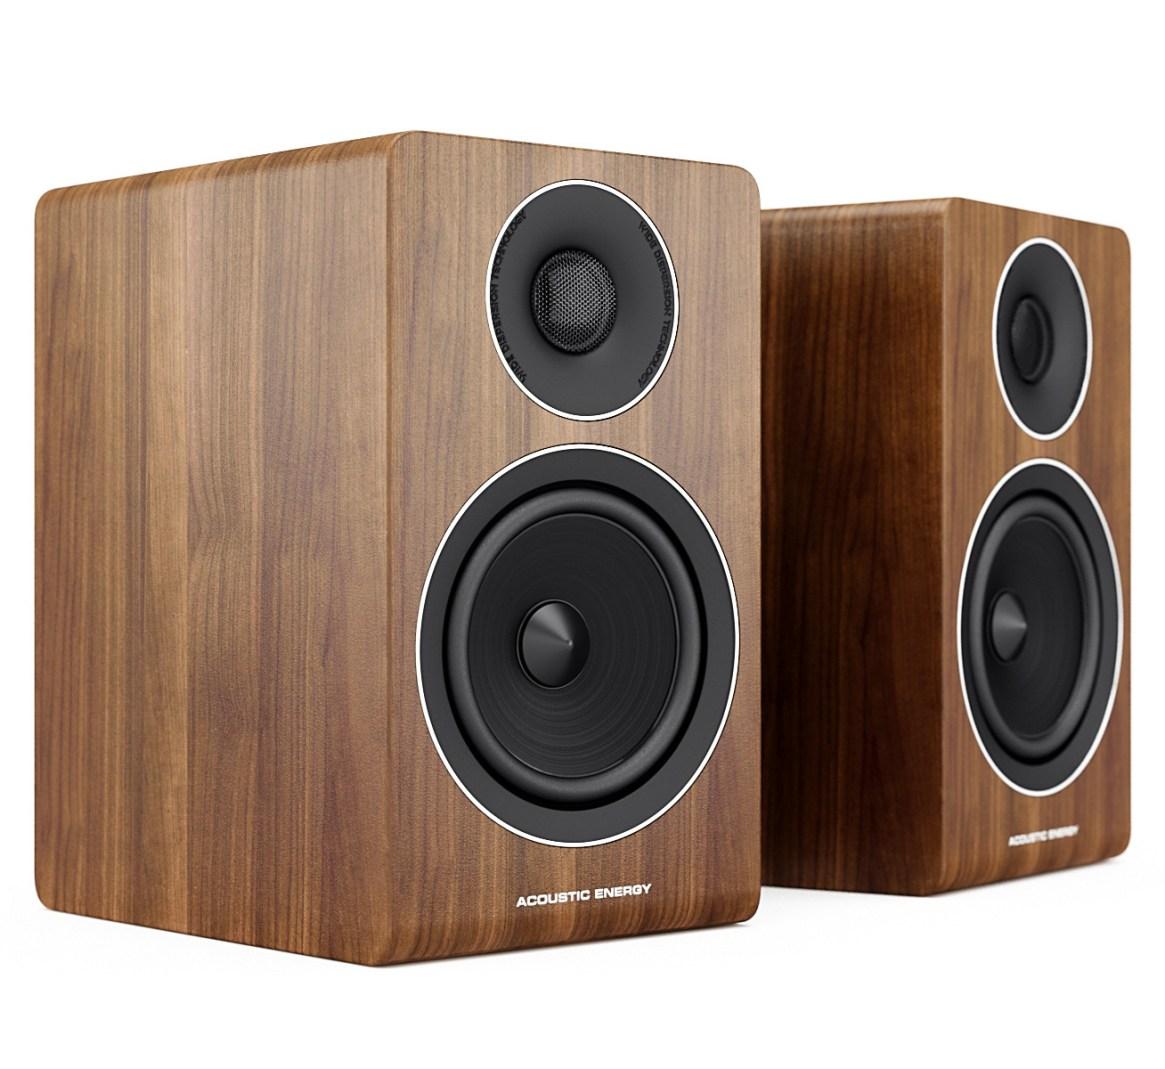 Acoustic Energy AE300 (Walnut)